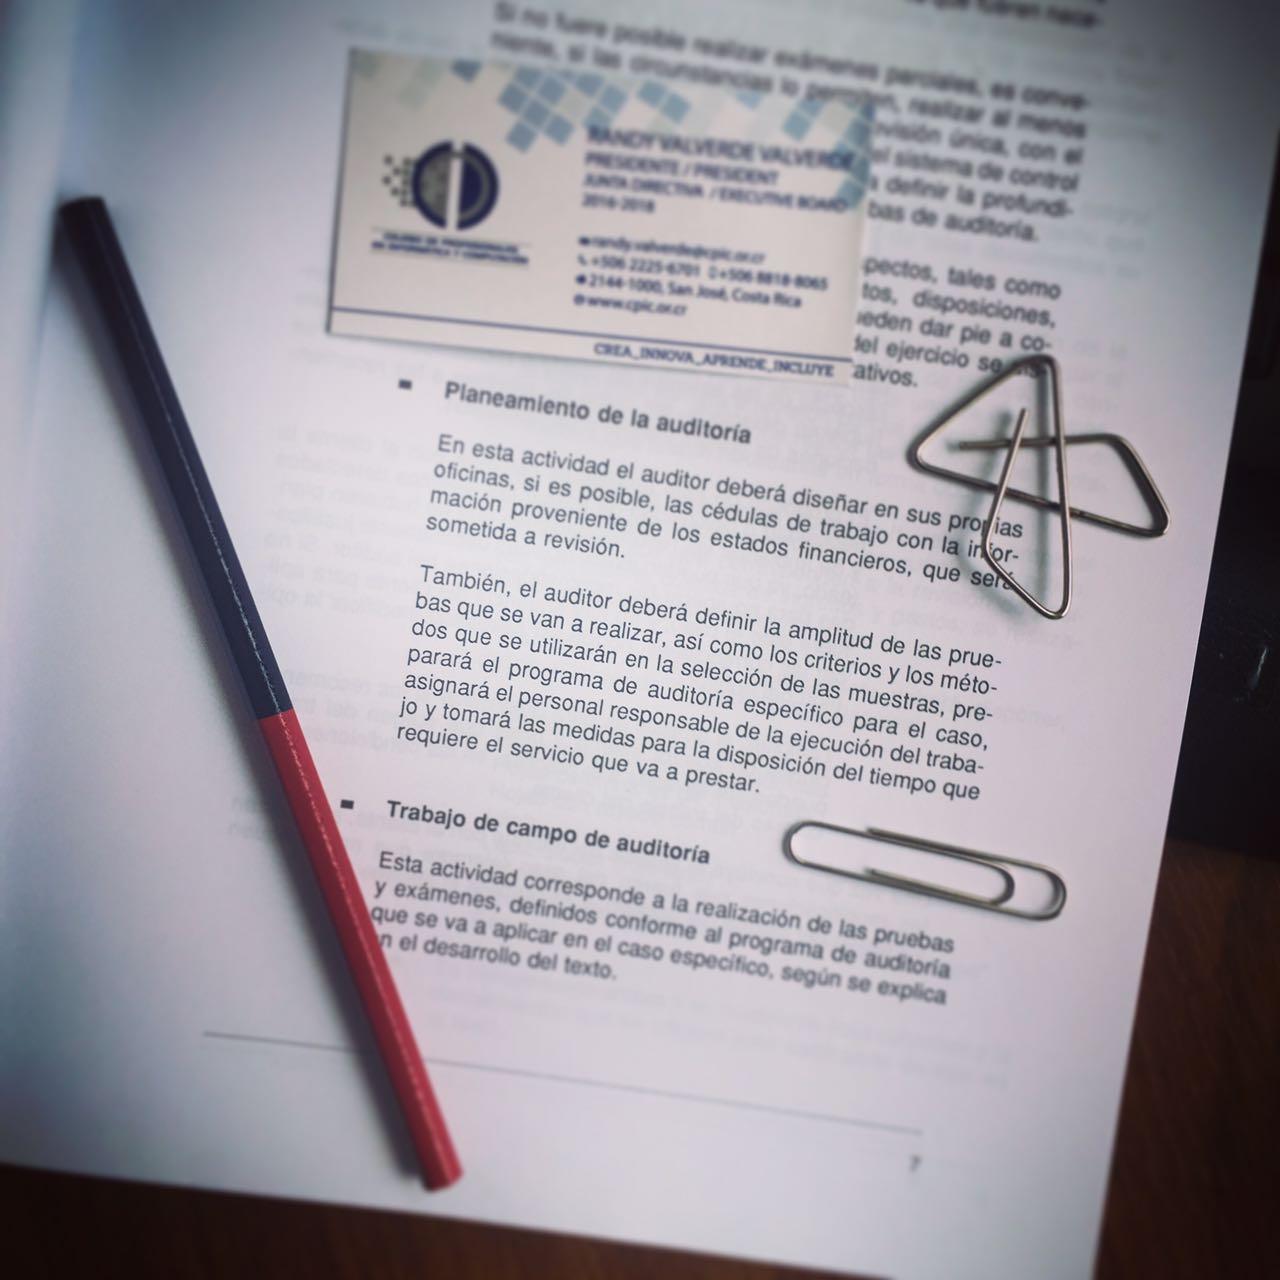 Planeamiento - Auditor Randy Valverde Valverde